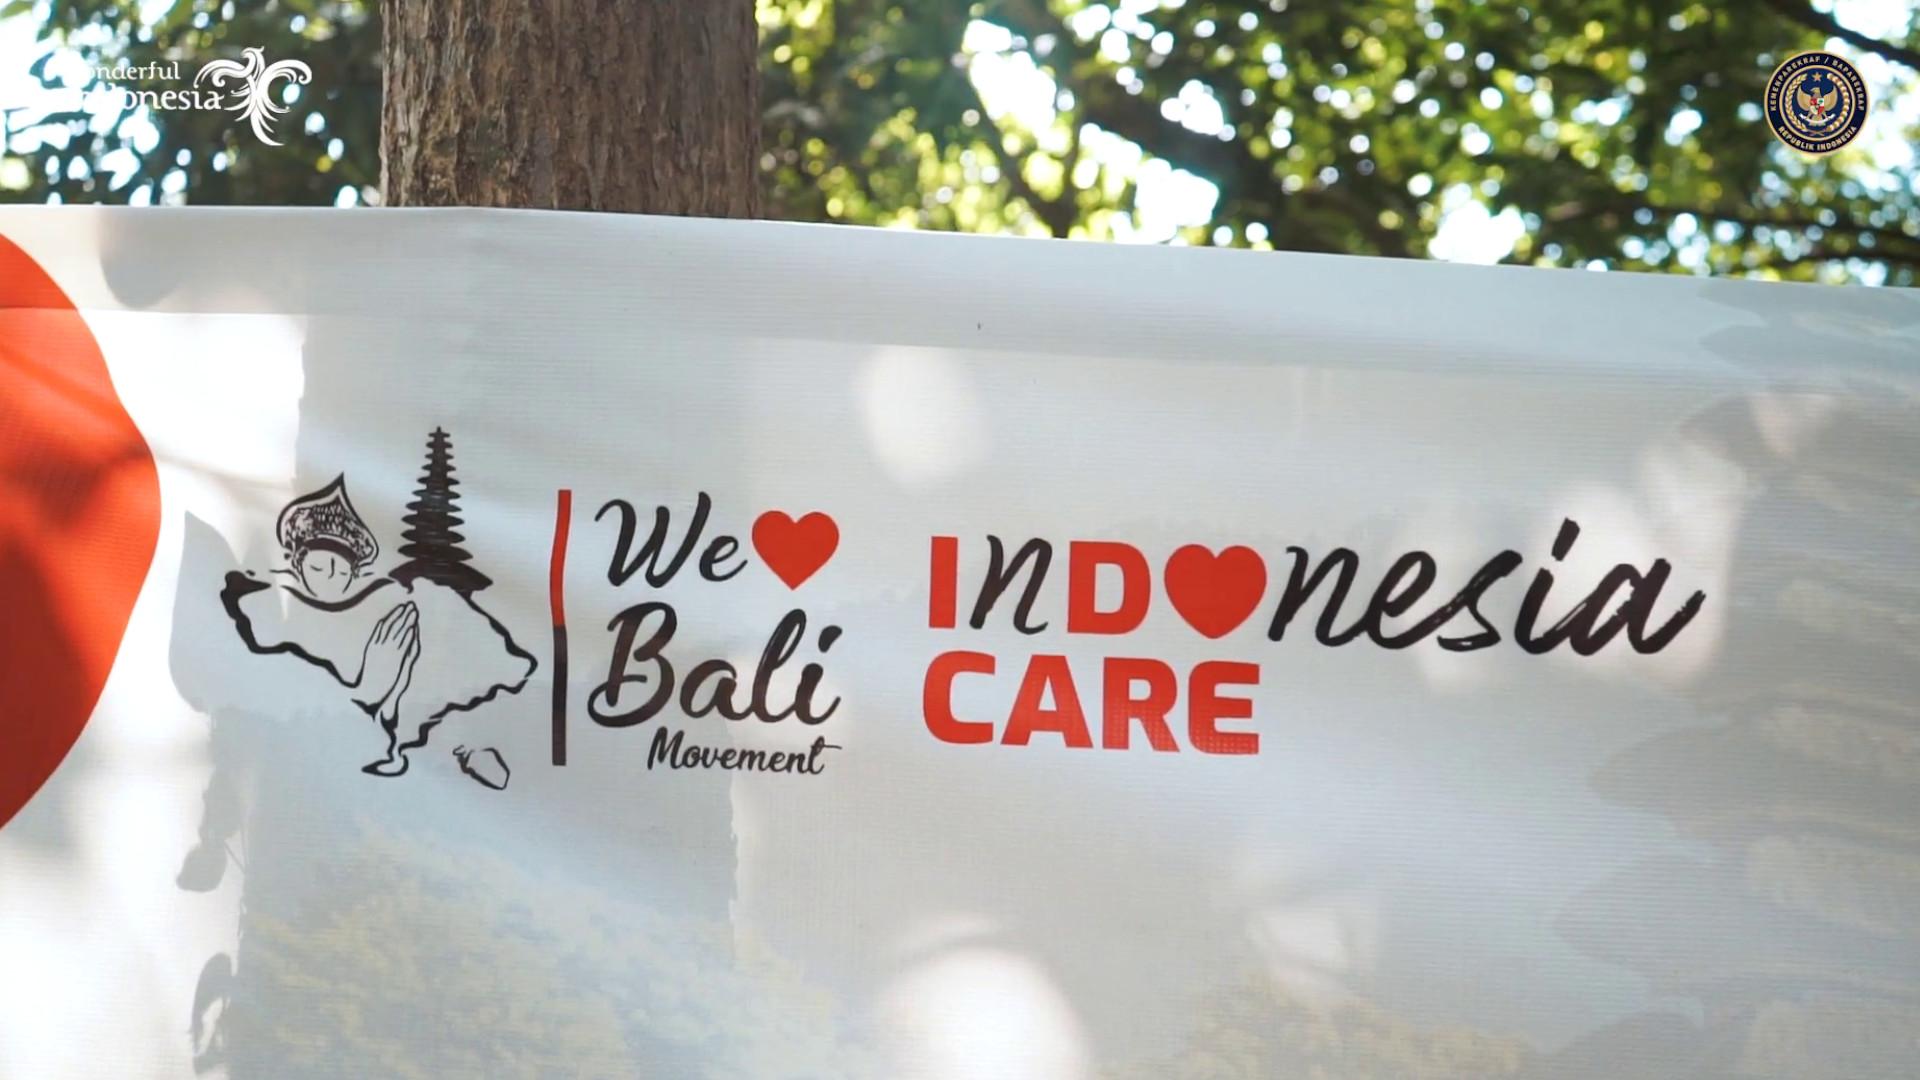 We Love Bali Educational Program Campaign by Kemenparekraf